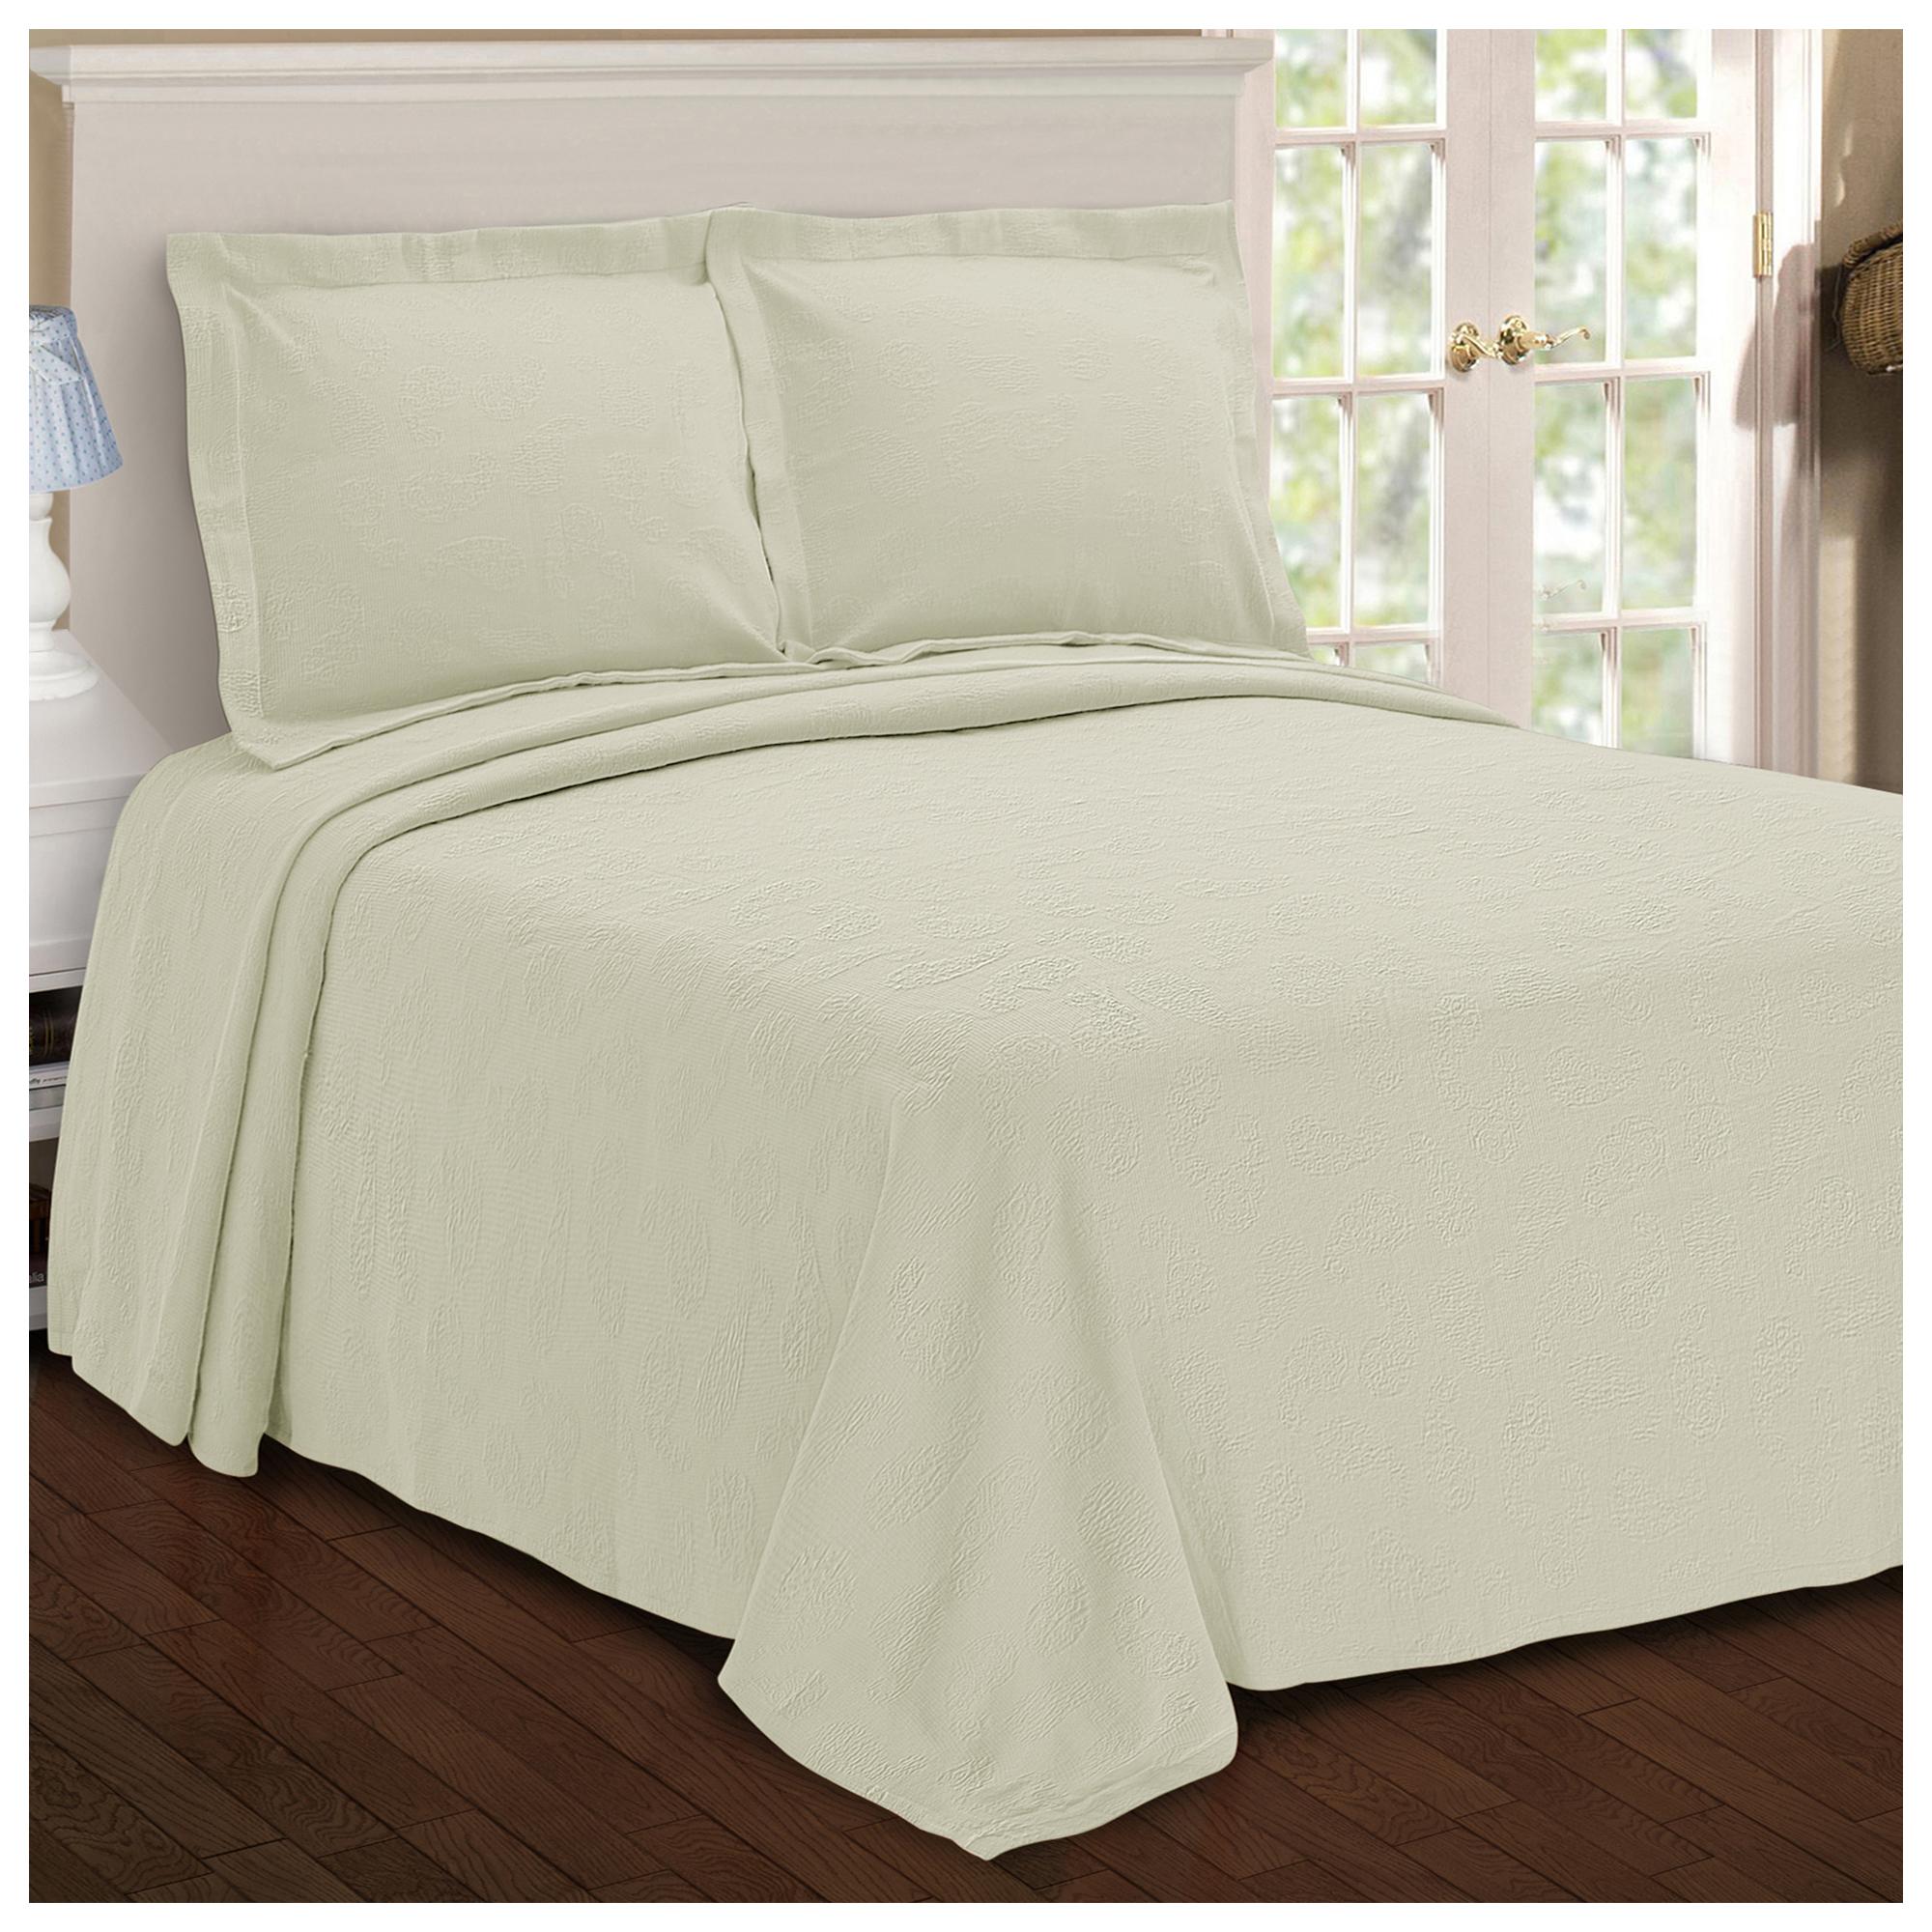 Paisley 100 Cotton Jacquard Matelasse Bedspread Ebay